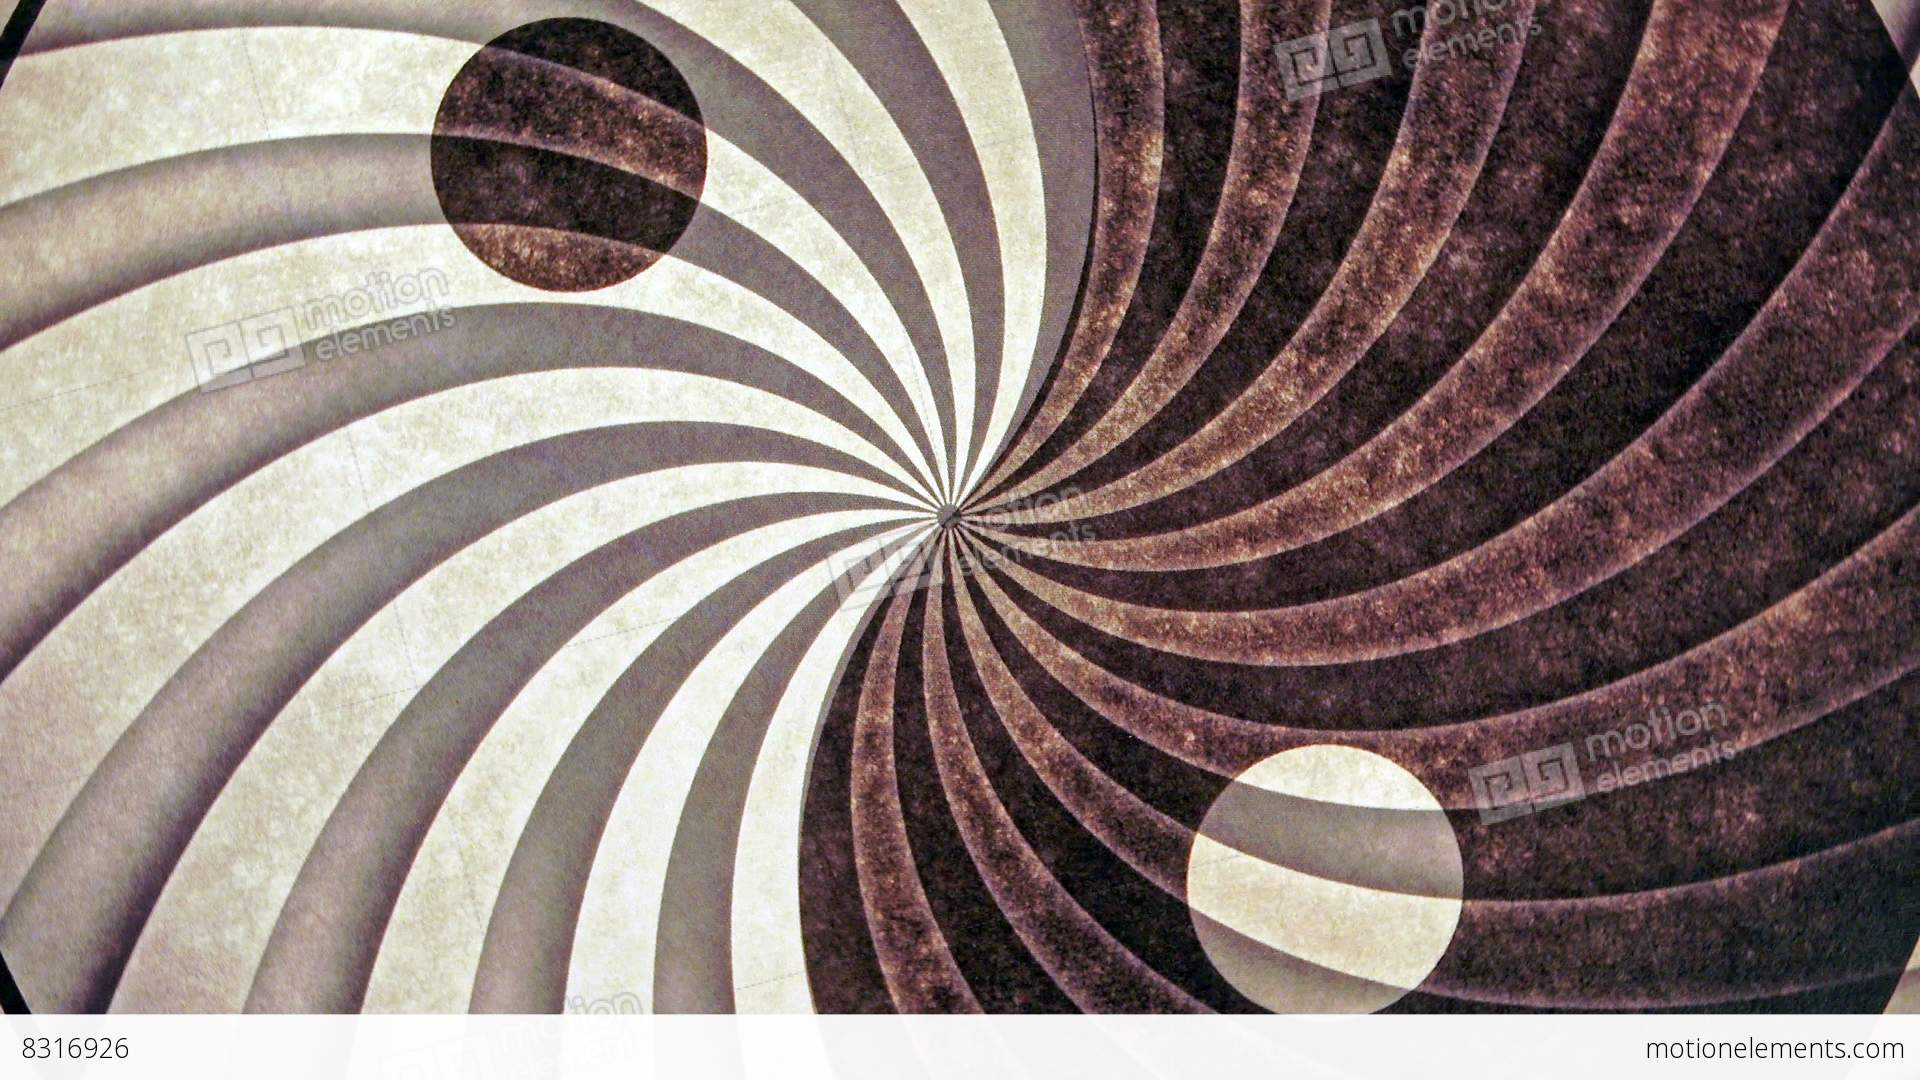 yin yang spiral eddy animation background stock video footage yin yang spiral eddy animation background stock video footage